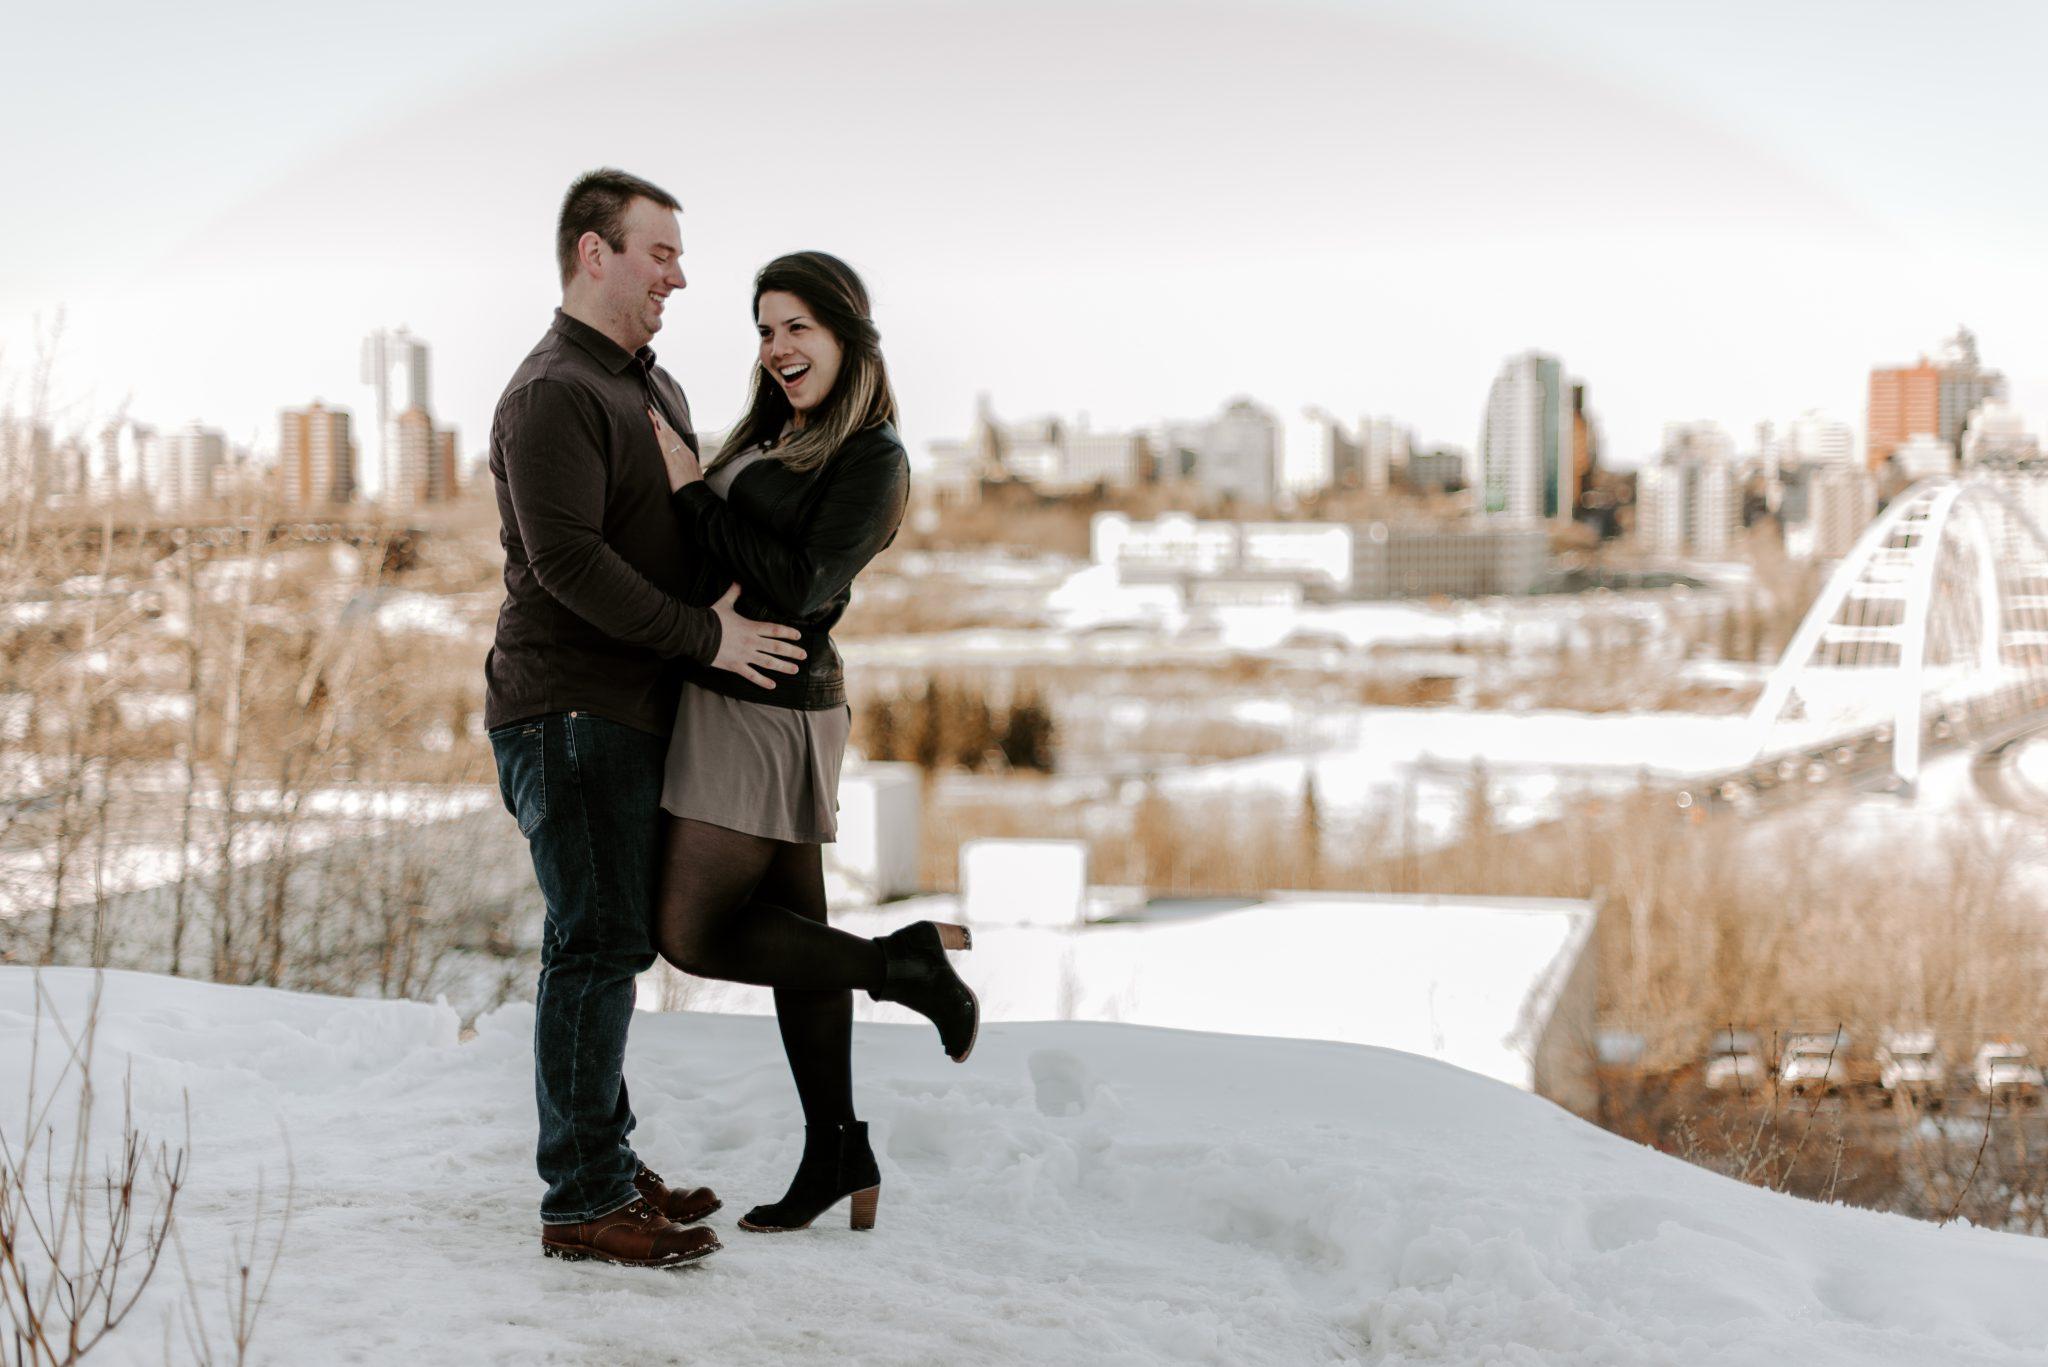 Edmonton Proposal Photography Session